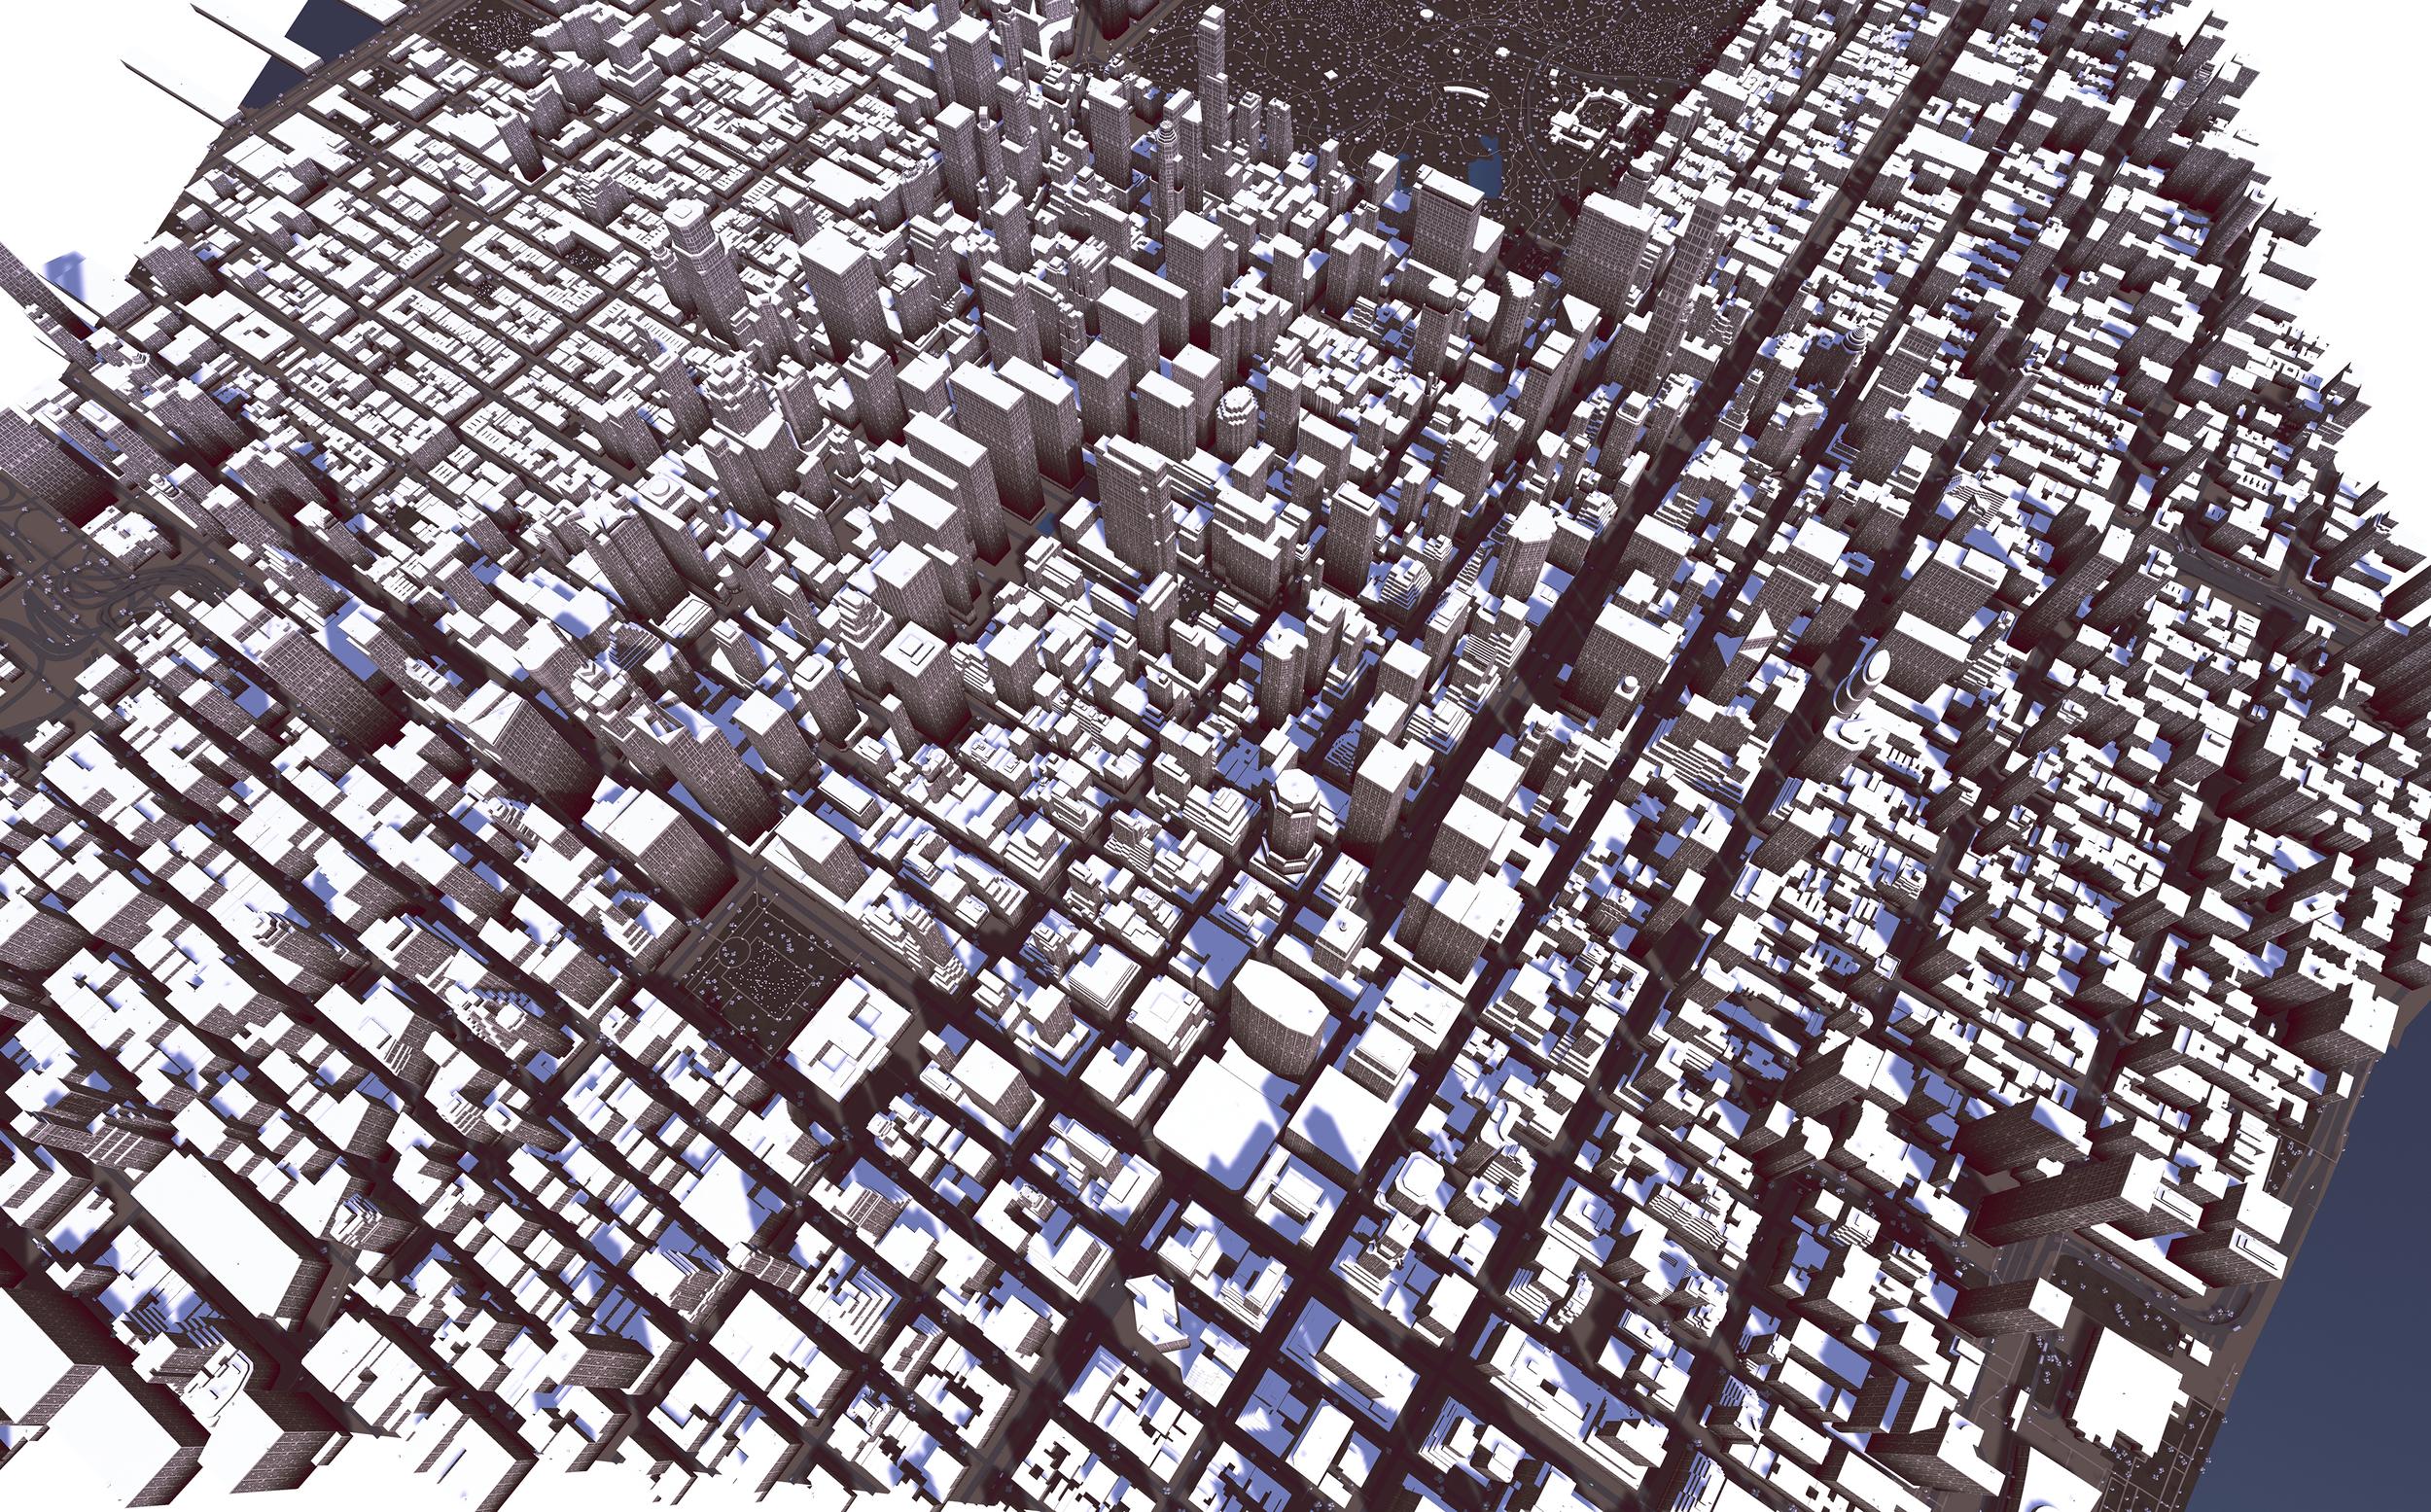 mantleshot_Lower Manhattan_(8192x5096)_2016-05-09_19-55-49.jpg